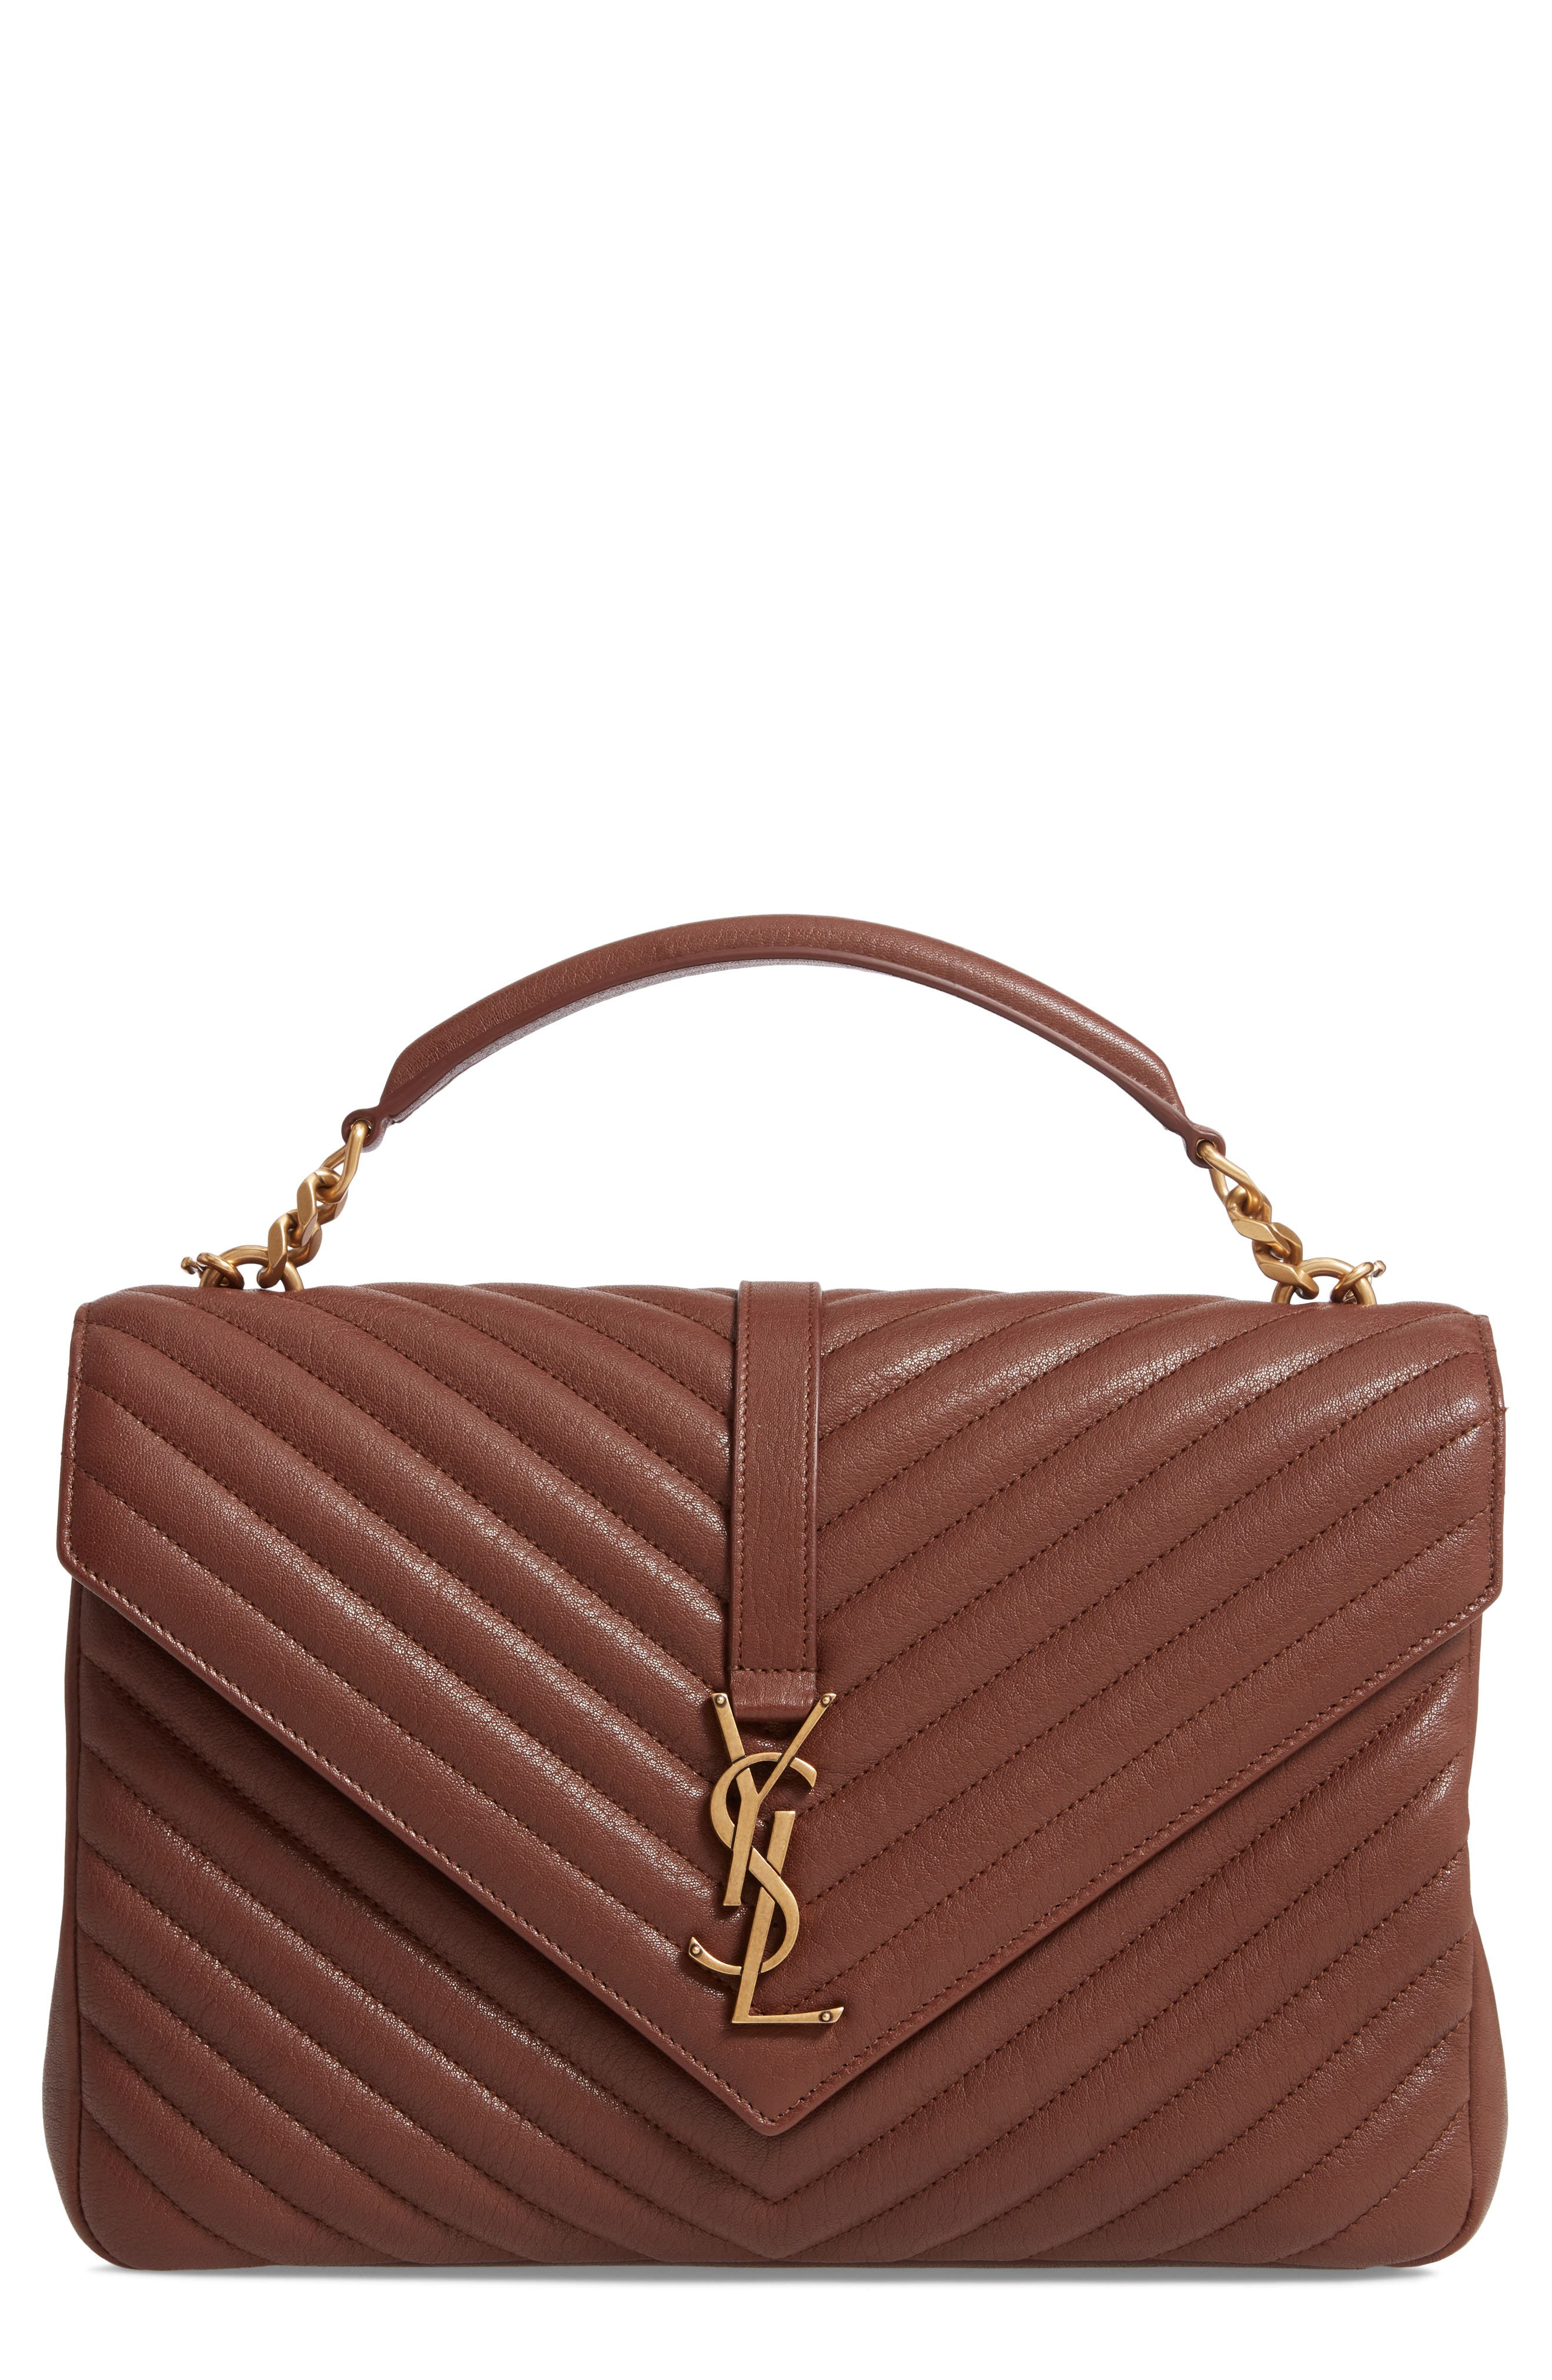 Medium College Shoulder Bag by Saint Laurent